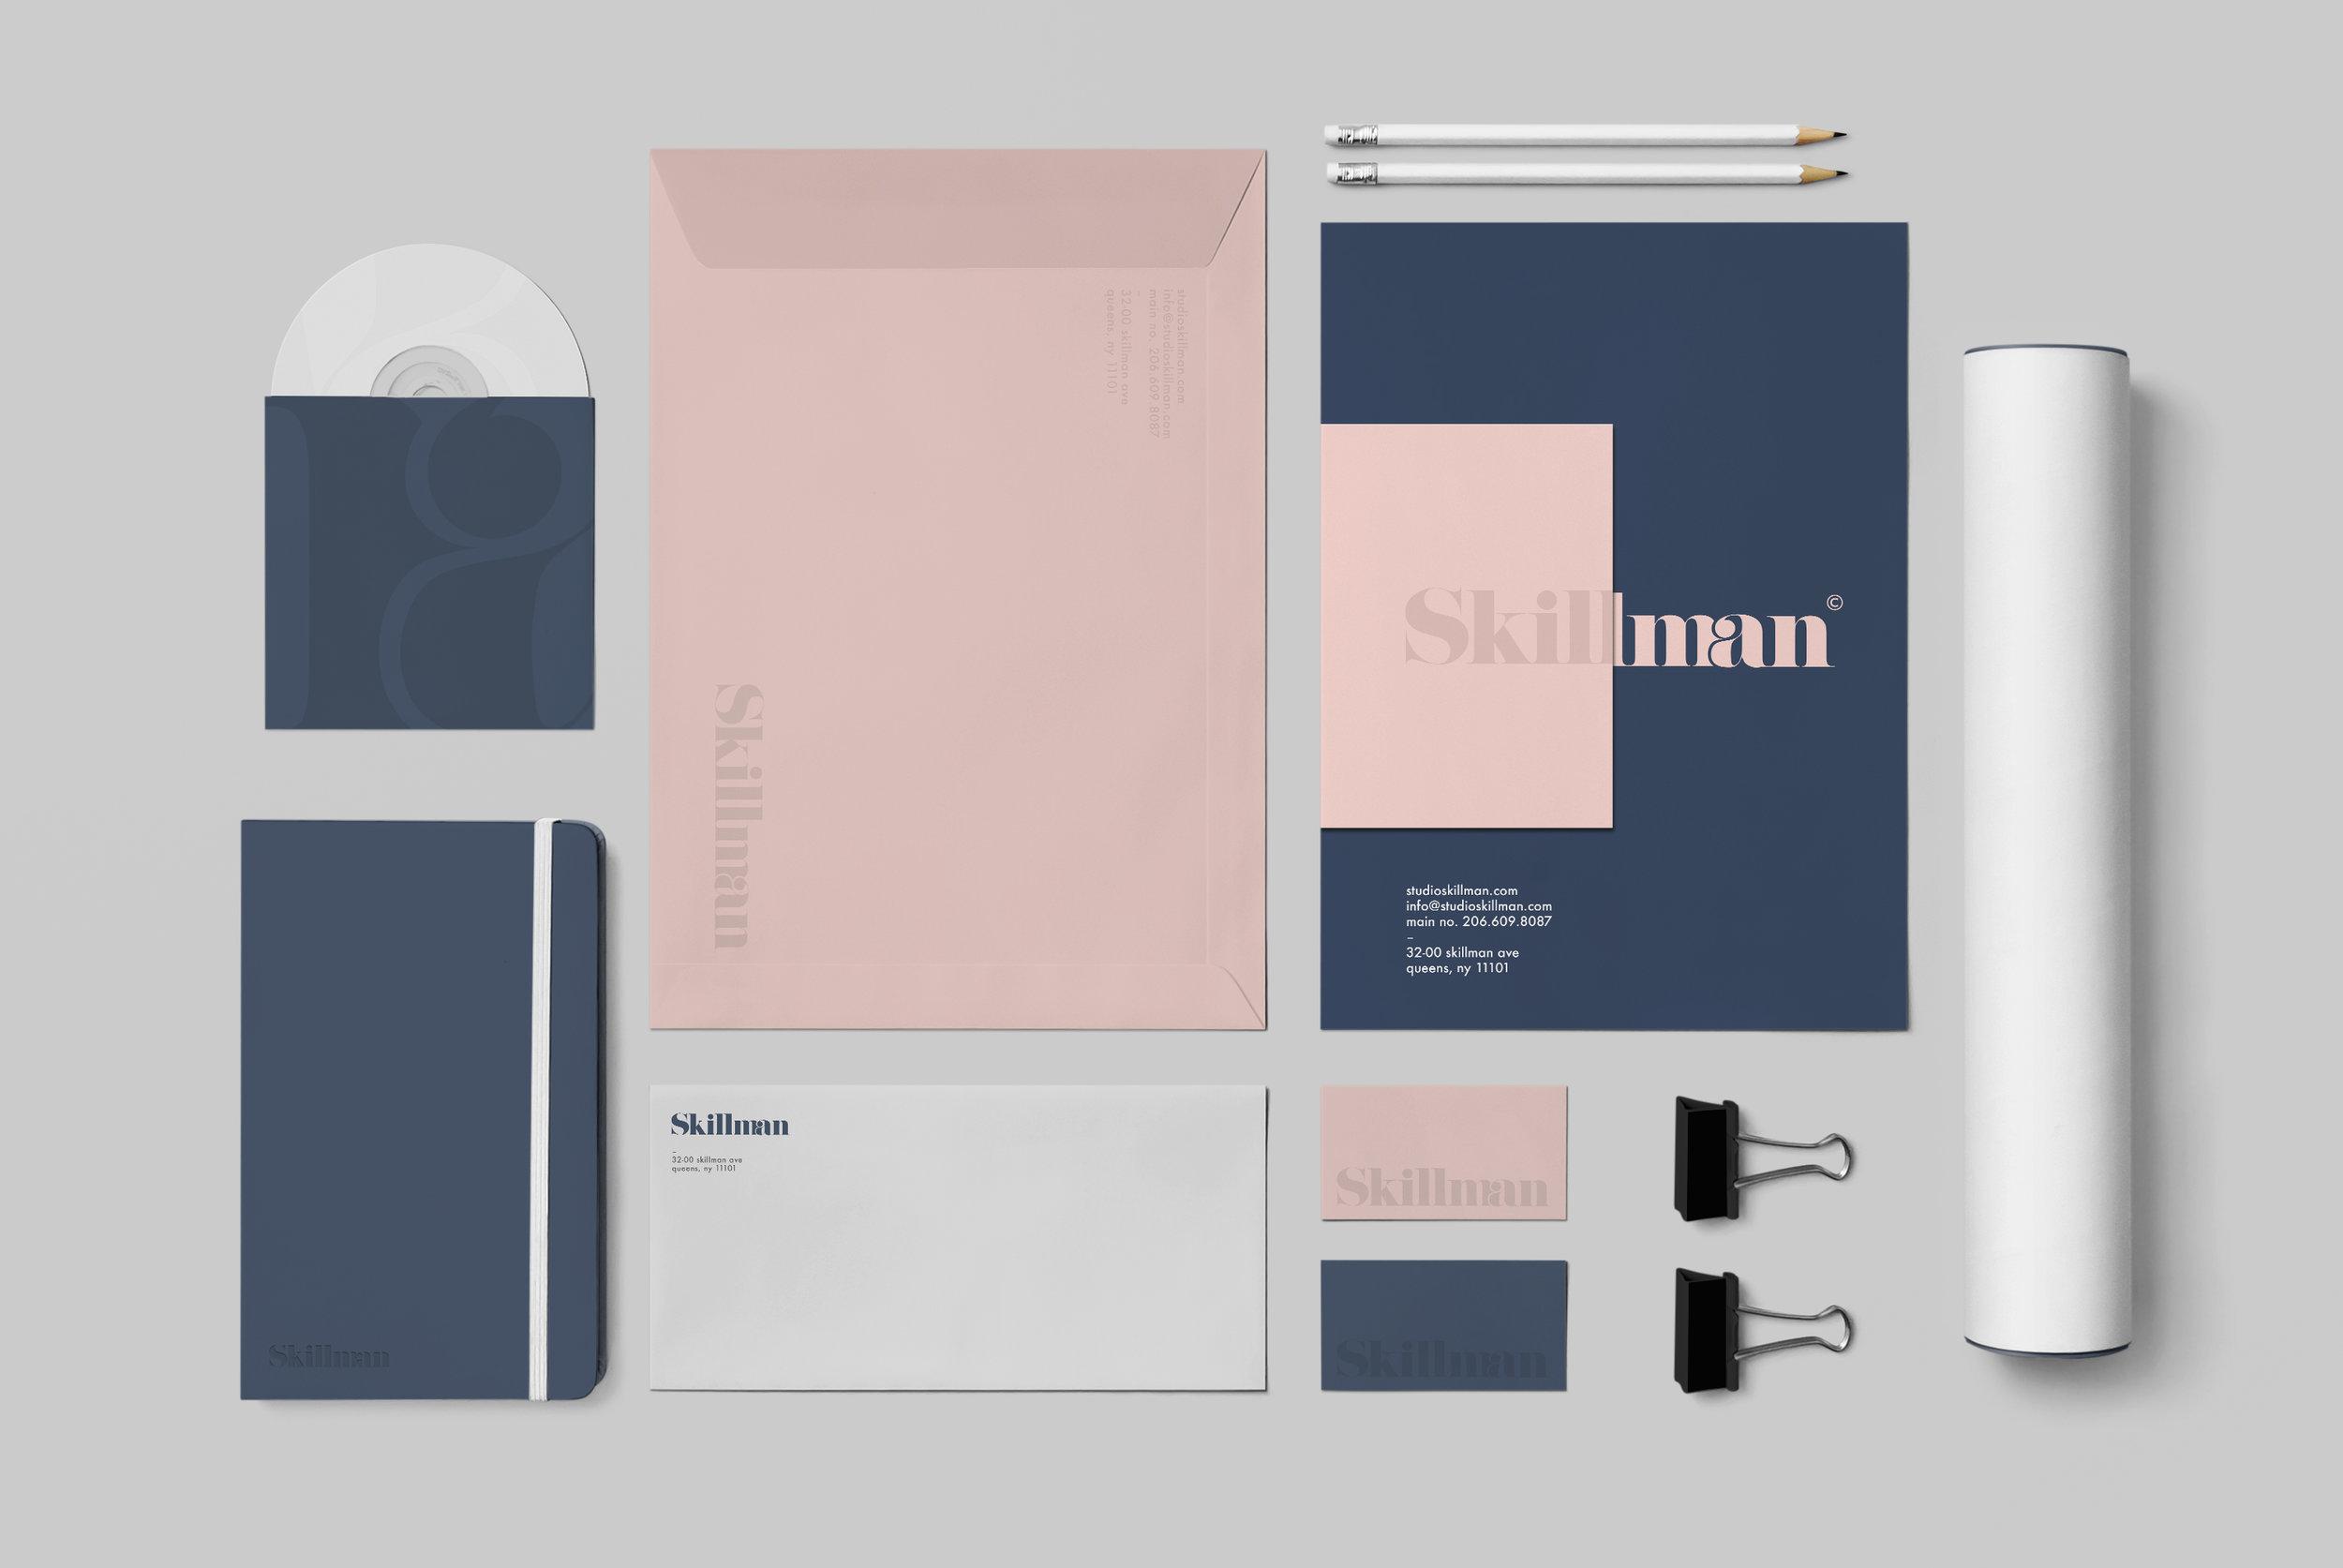 Studio_Bloq-Skillman-1.jpg